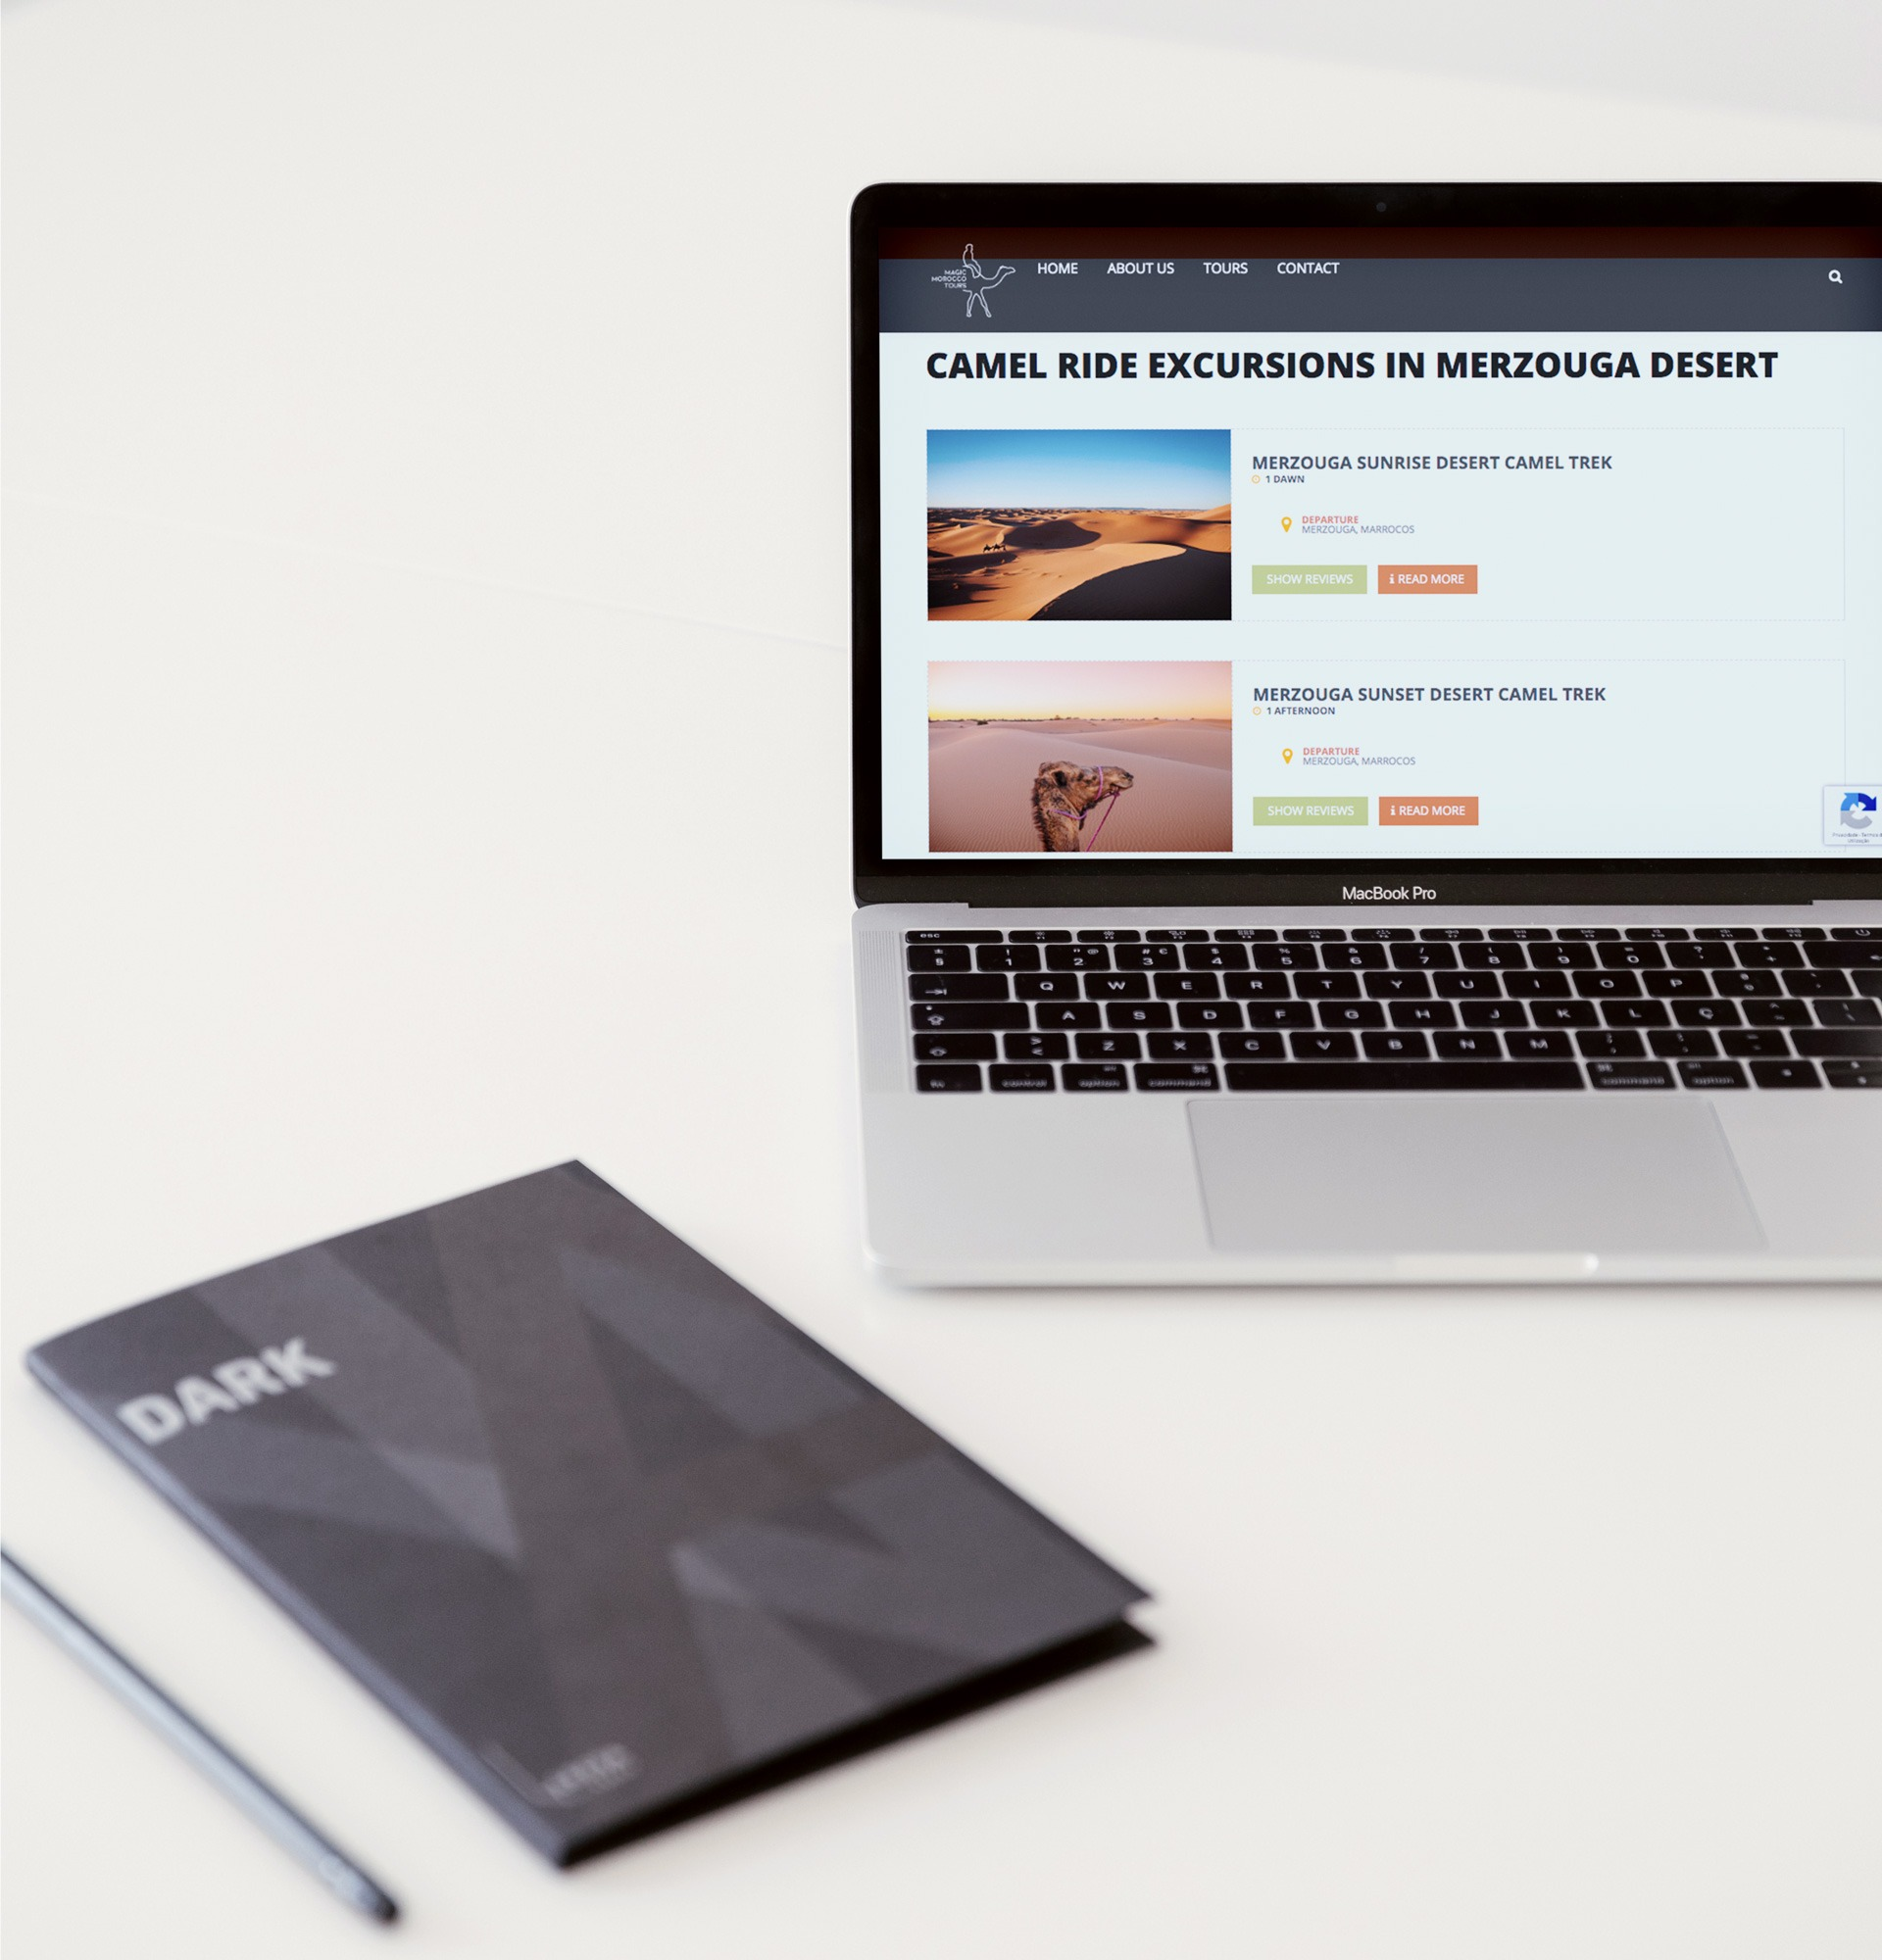 webdesign website magic morroco tours